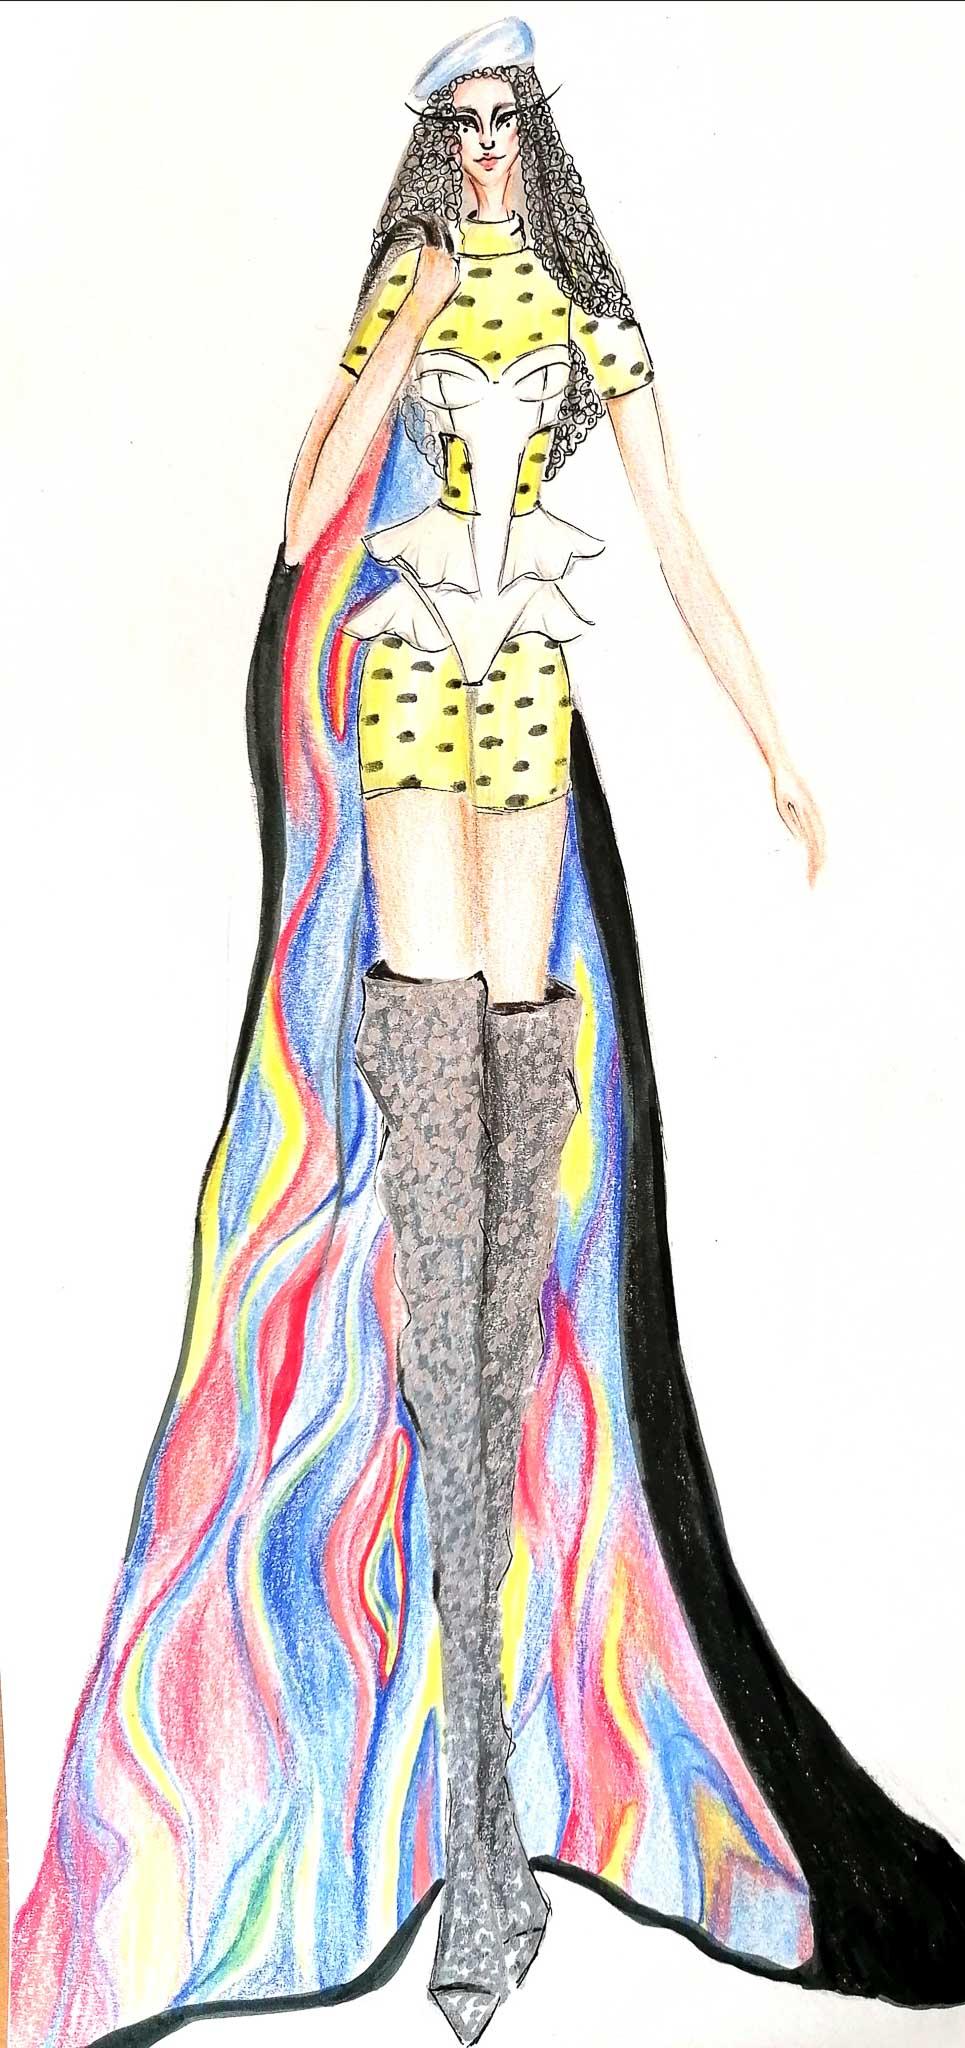 Xenophilia: Chiara Herzog, Germany, Student, Modefachschule Sigmaringen (Create your Revolution)